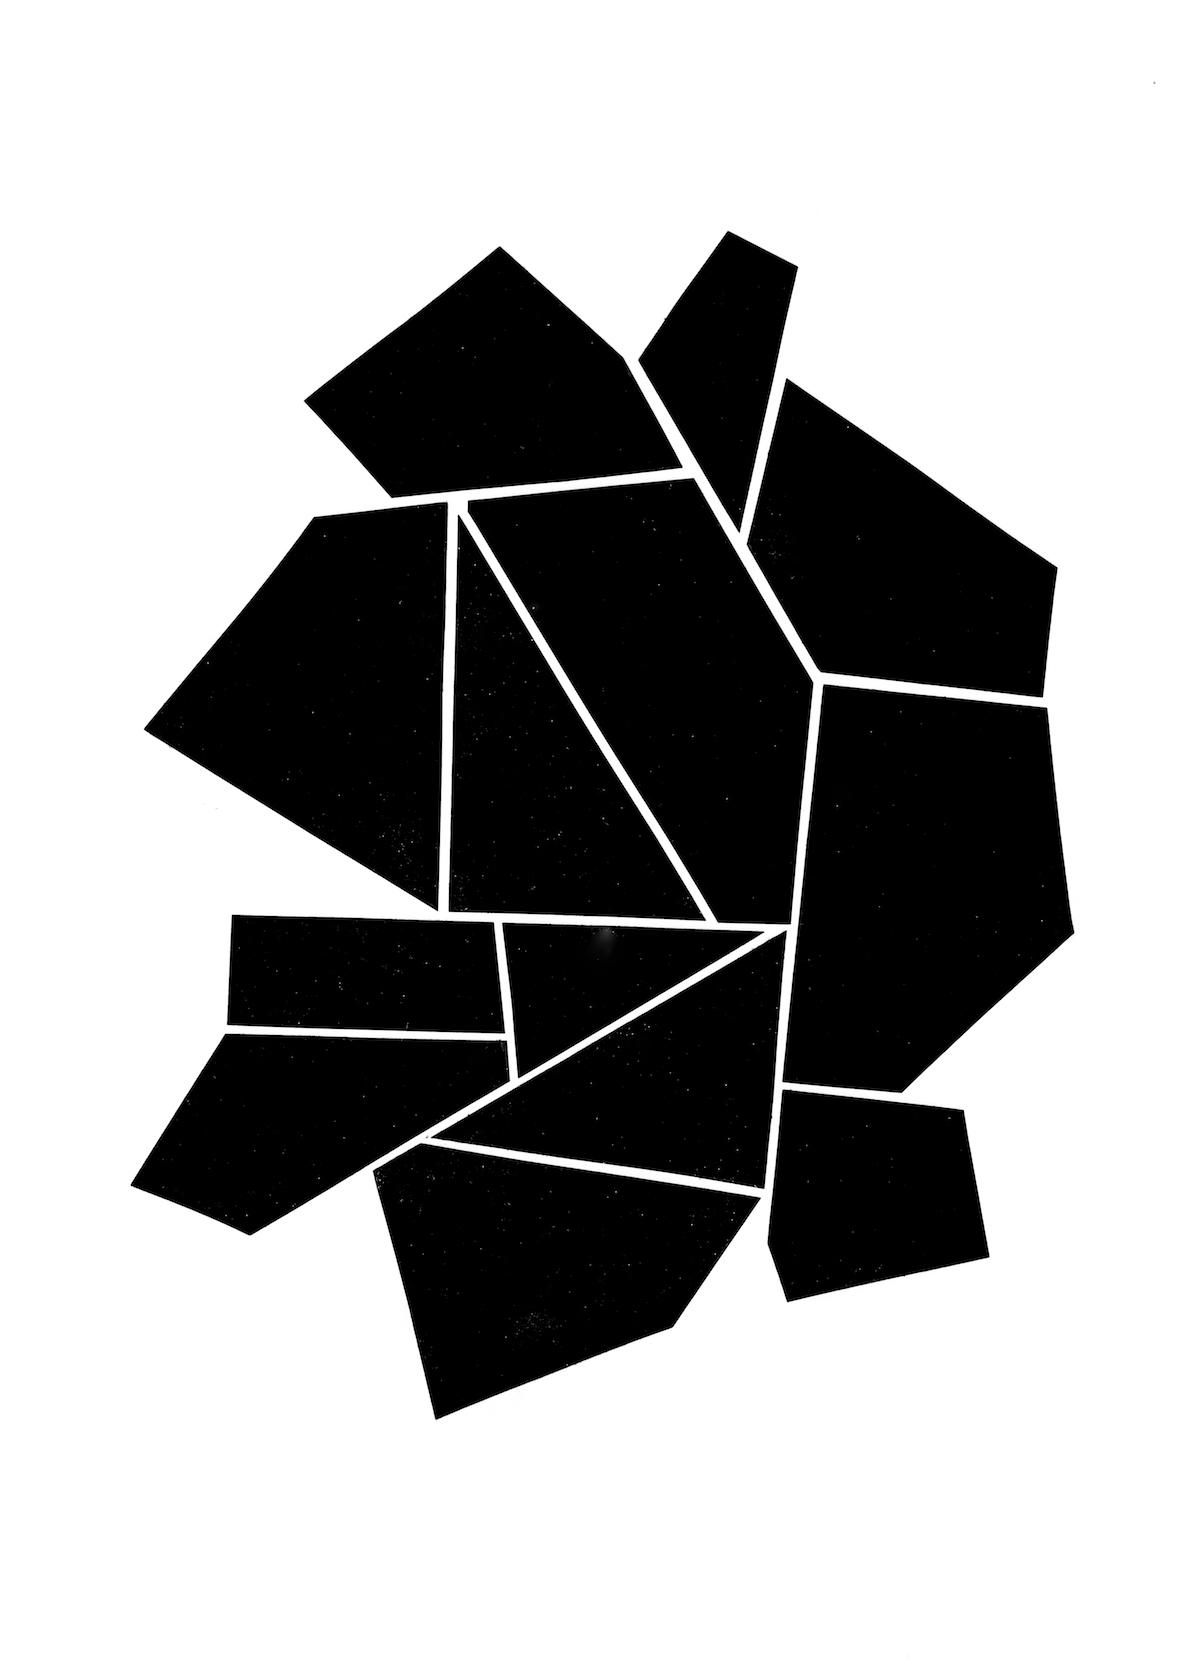 modern minimalism collage series, no. 5